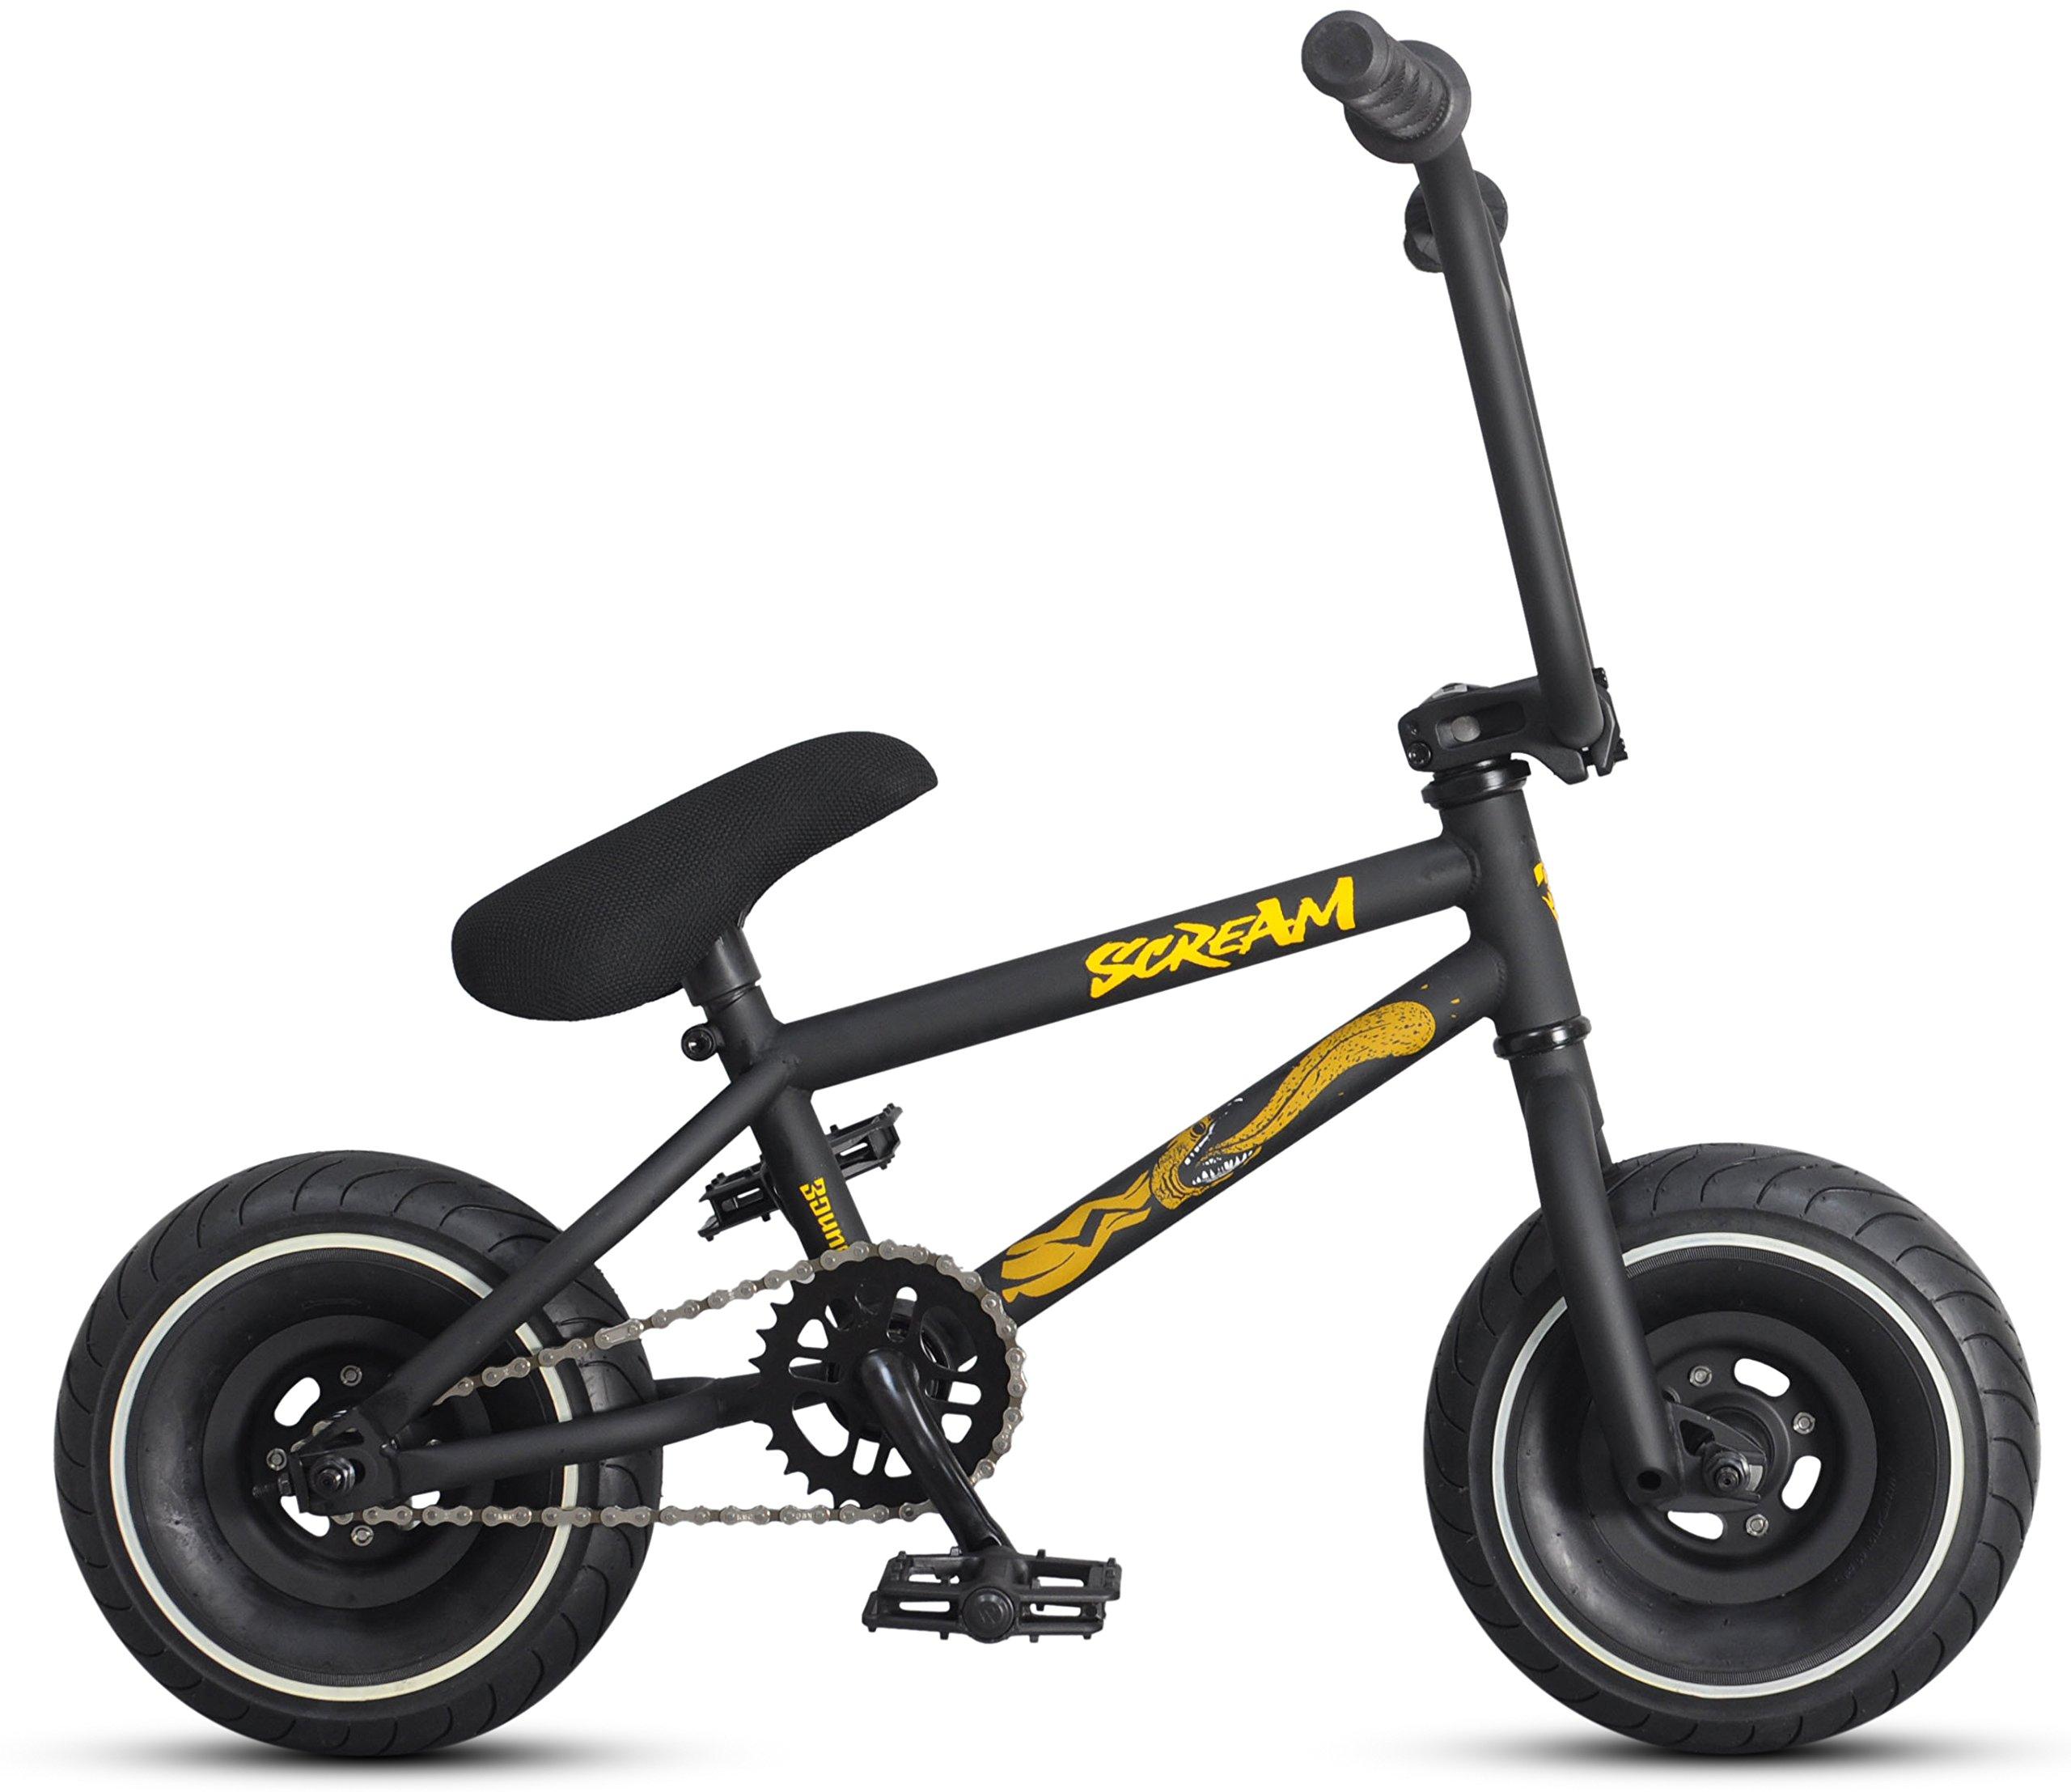 Bounce Scream Mini BMX bike